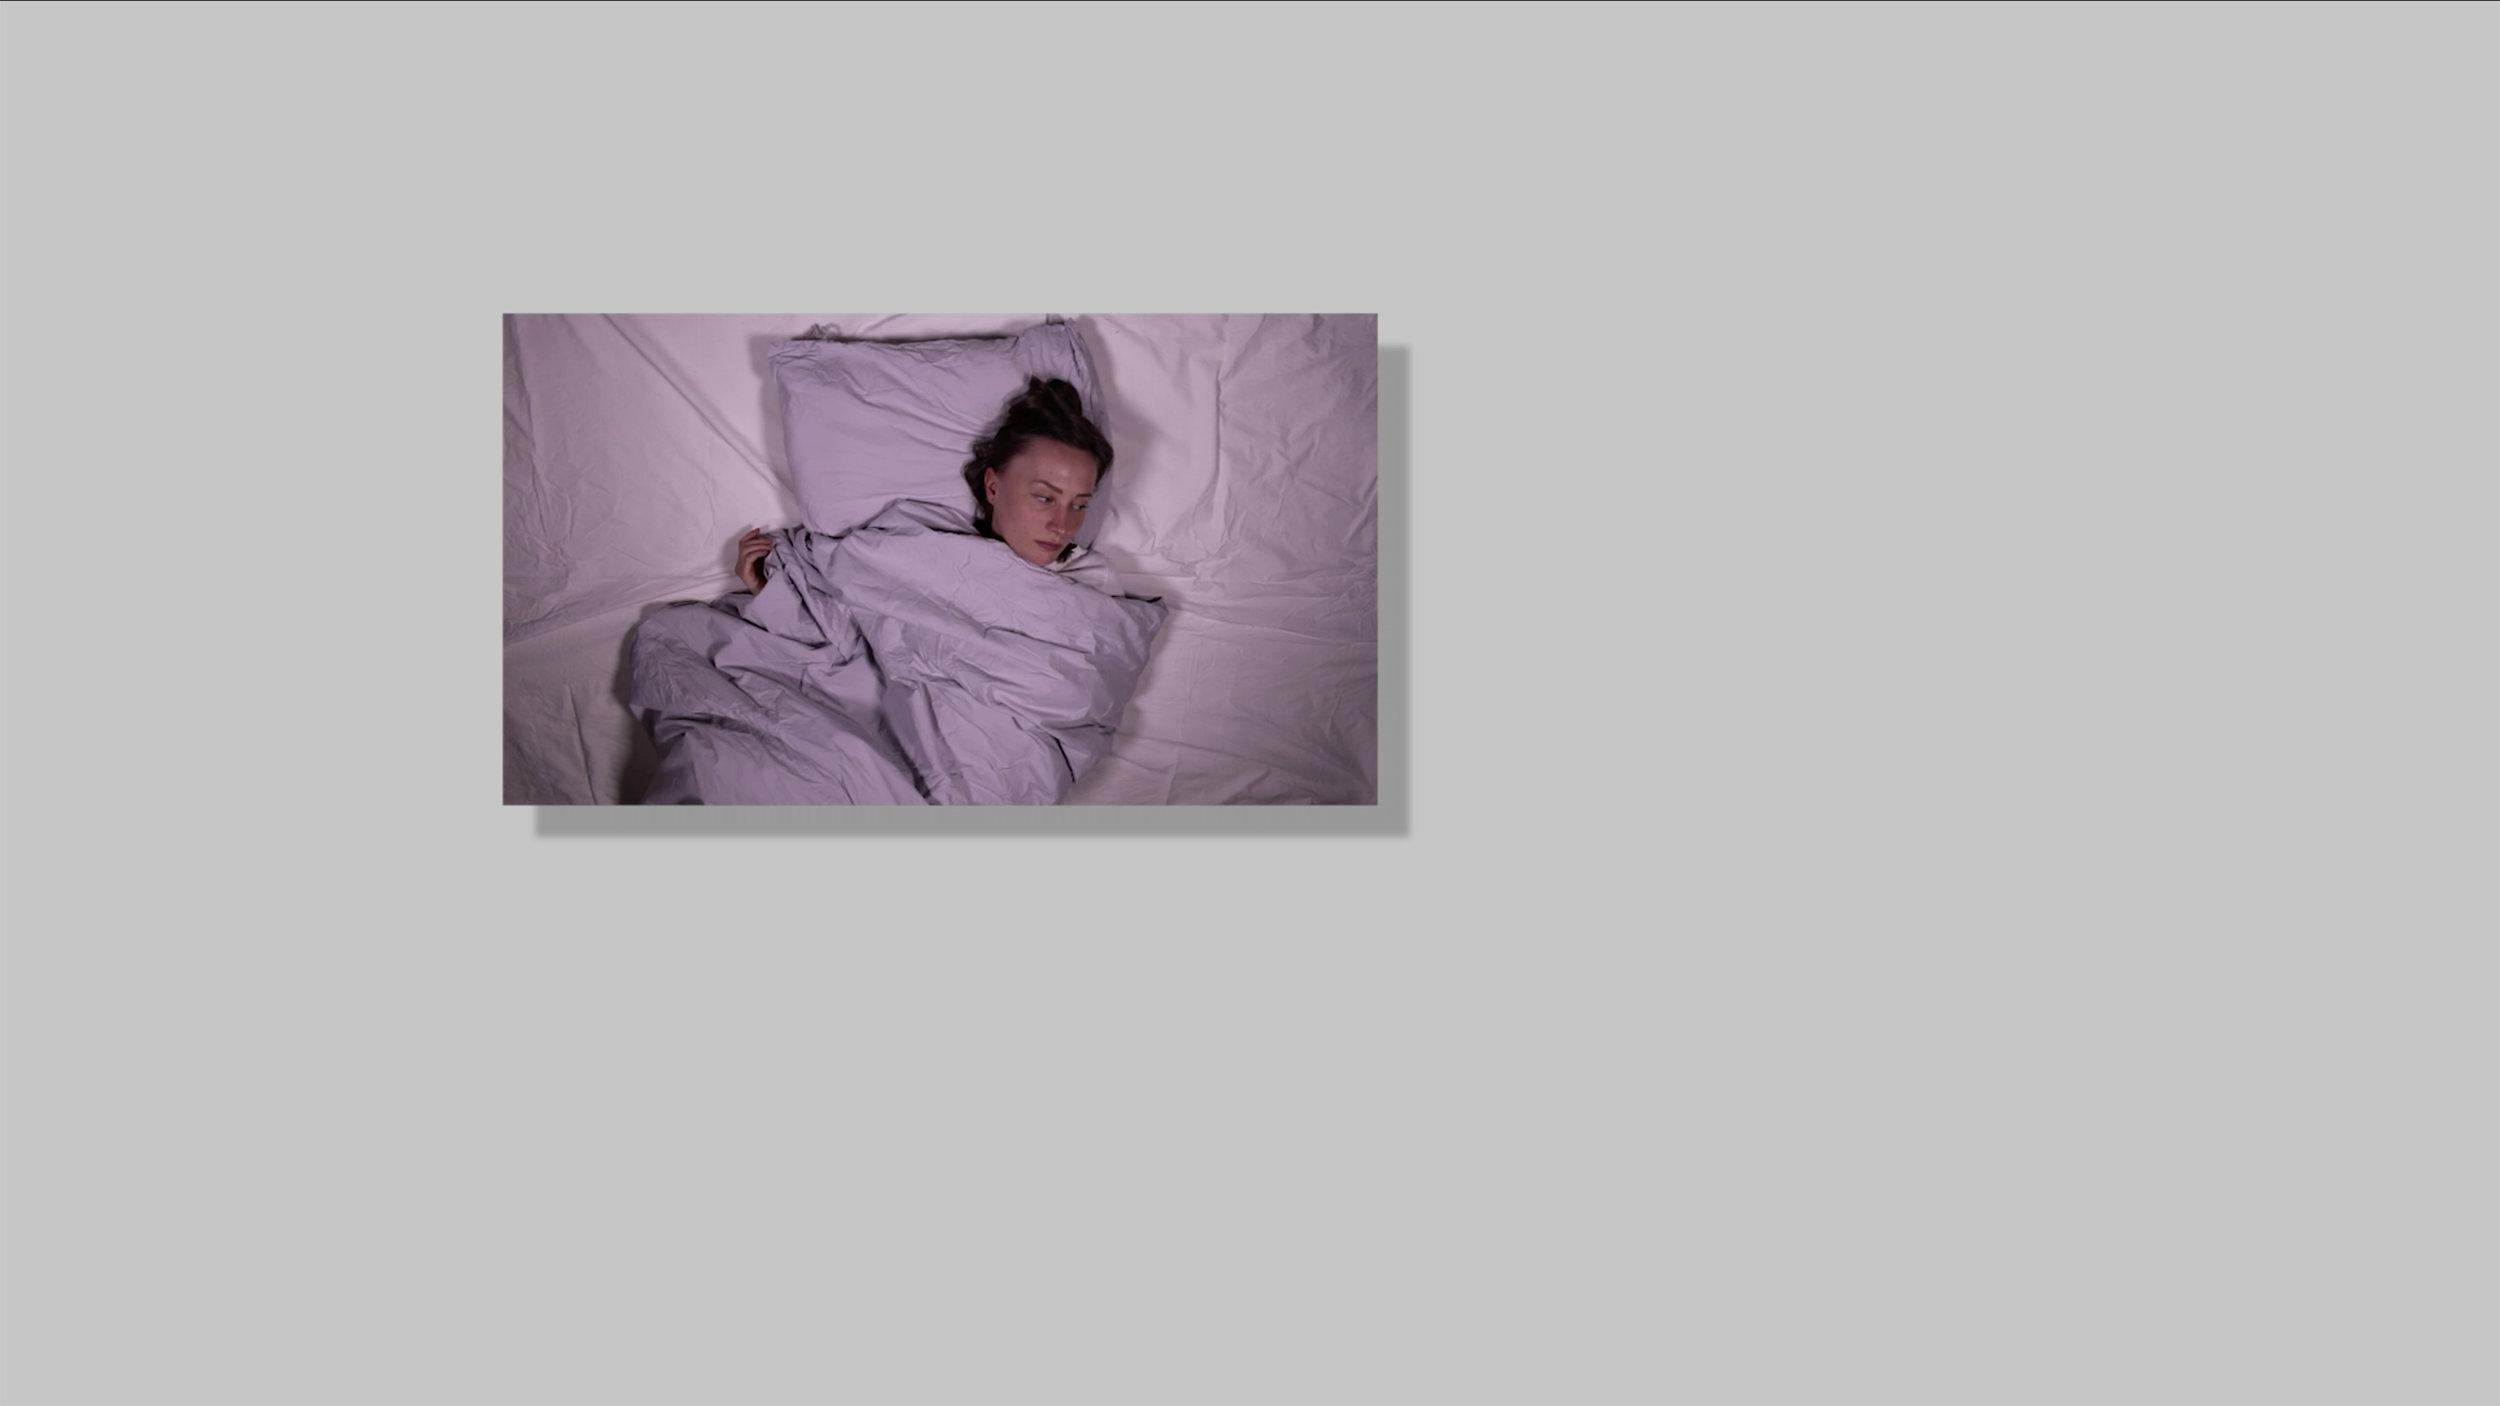 sickleave1_press_300dpi.jpg